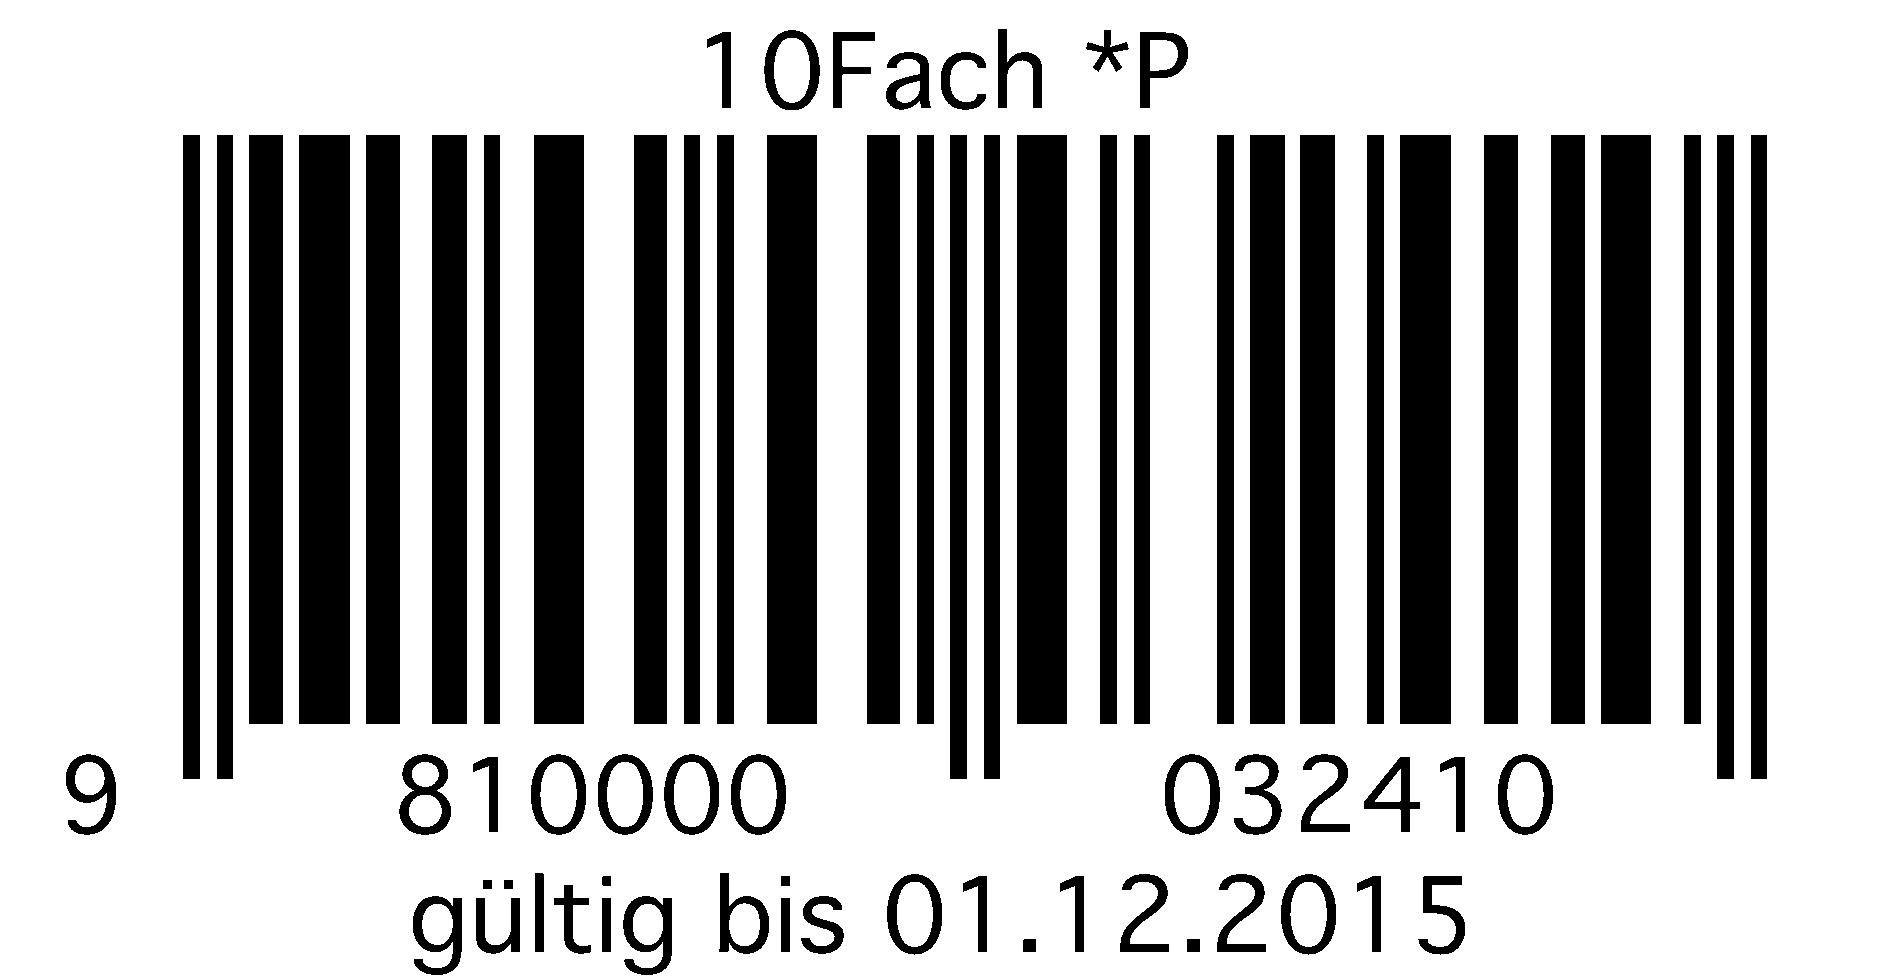 swqnbfh7.jpg